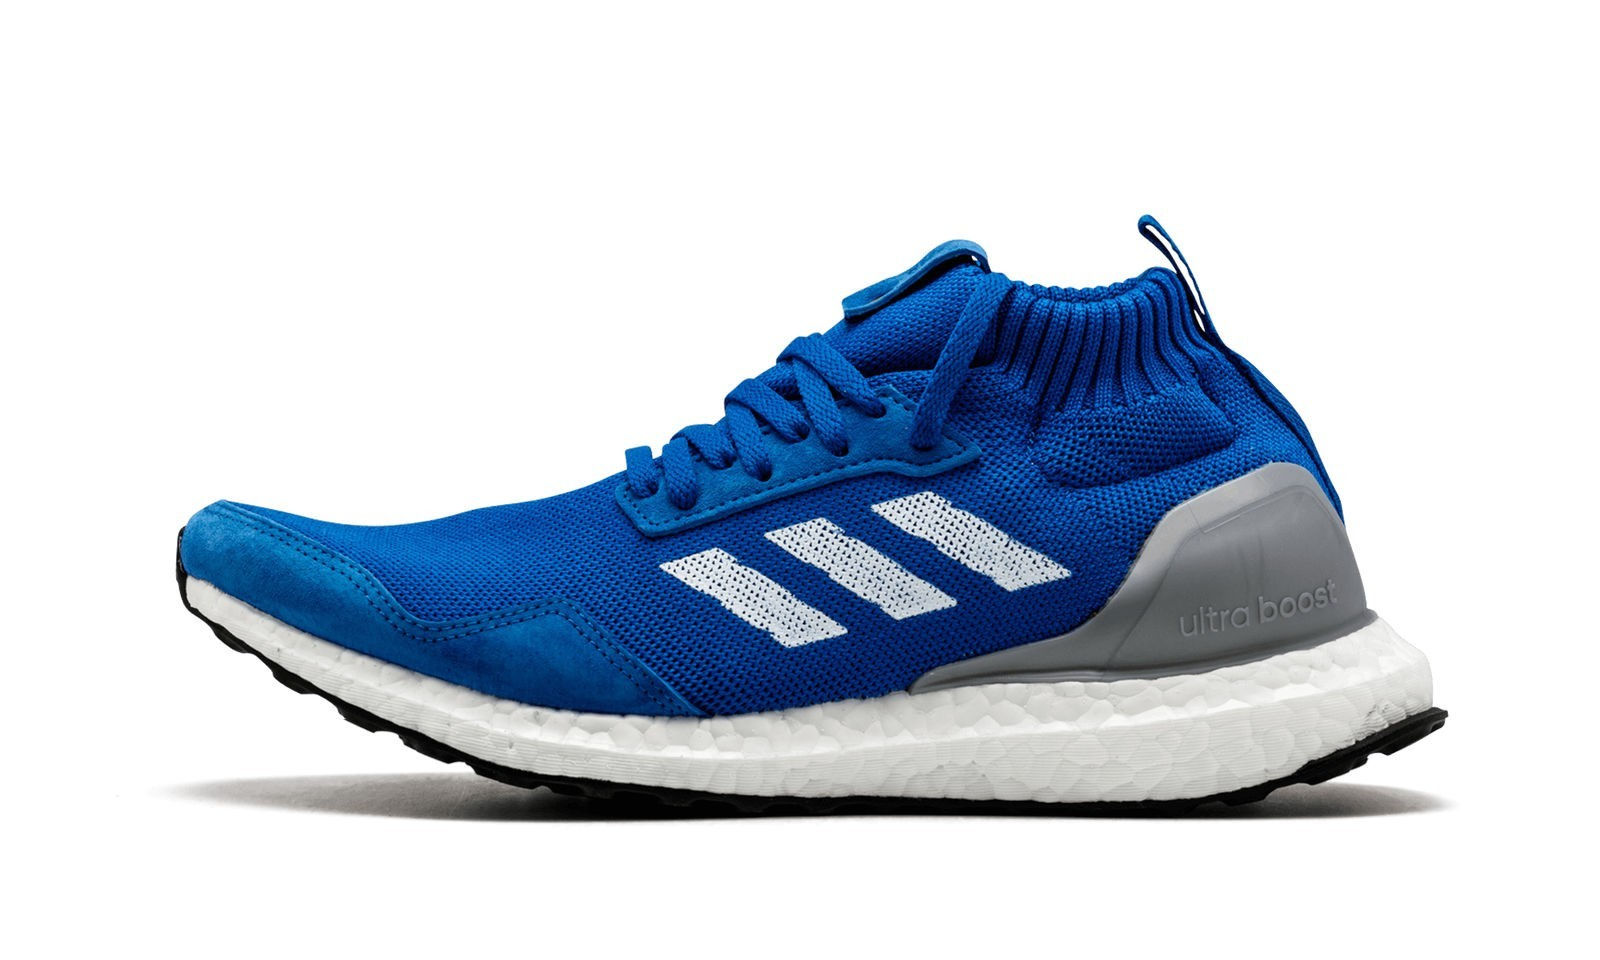 "Adidas Ultra Boost Mid ""Run Thru Time"" Azules/Blancas/Grises by3056"